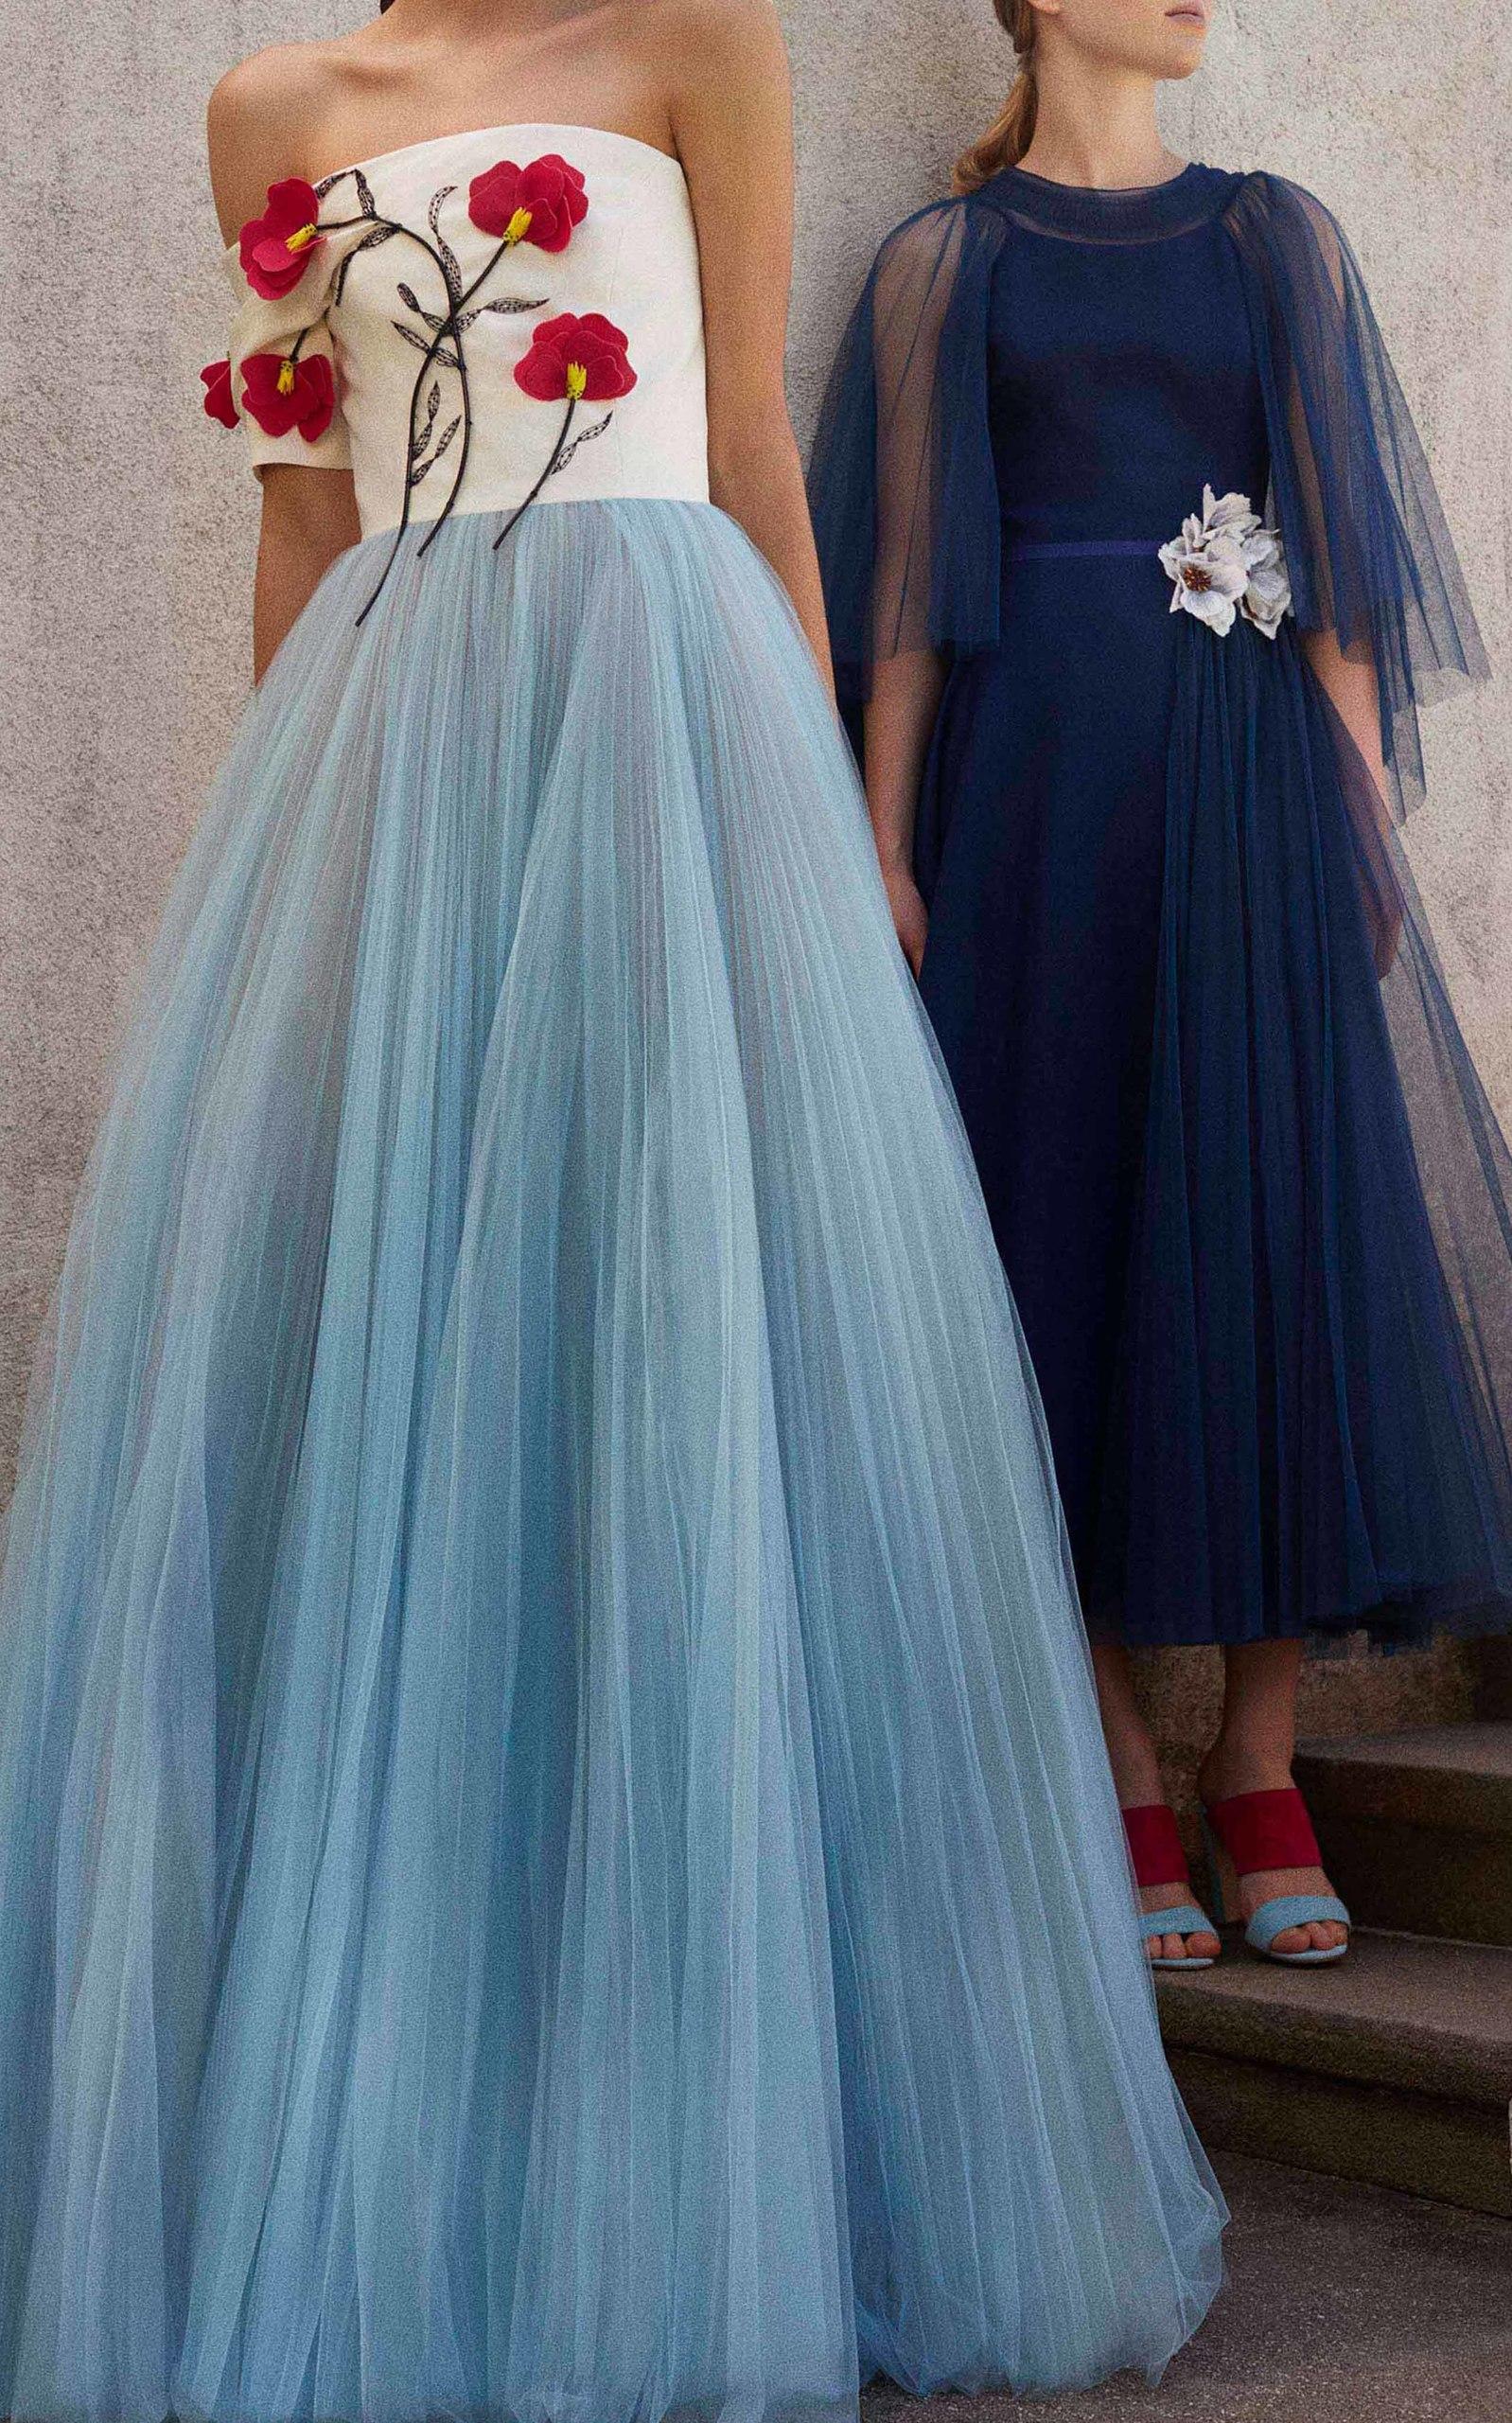 Floral Embroidered Tulle Ball Gown By Carolina Herrera Moda Operandi